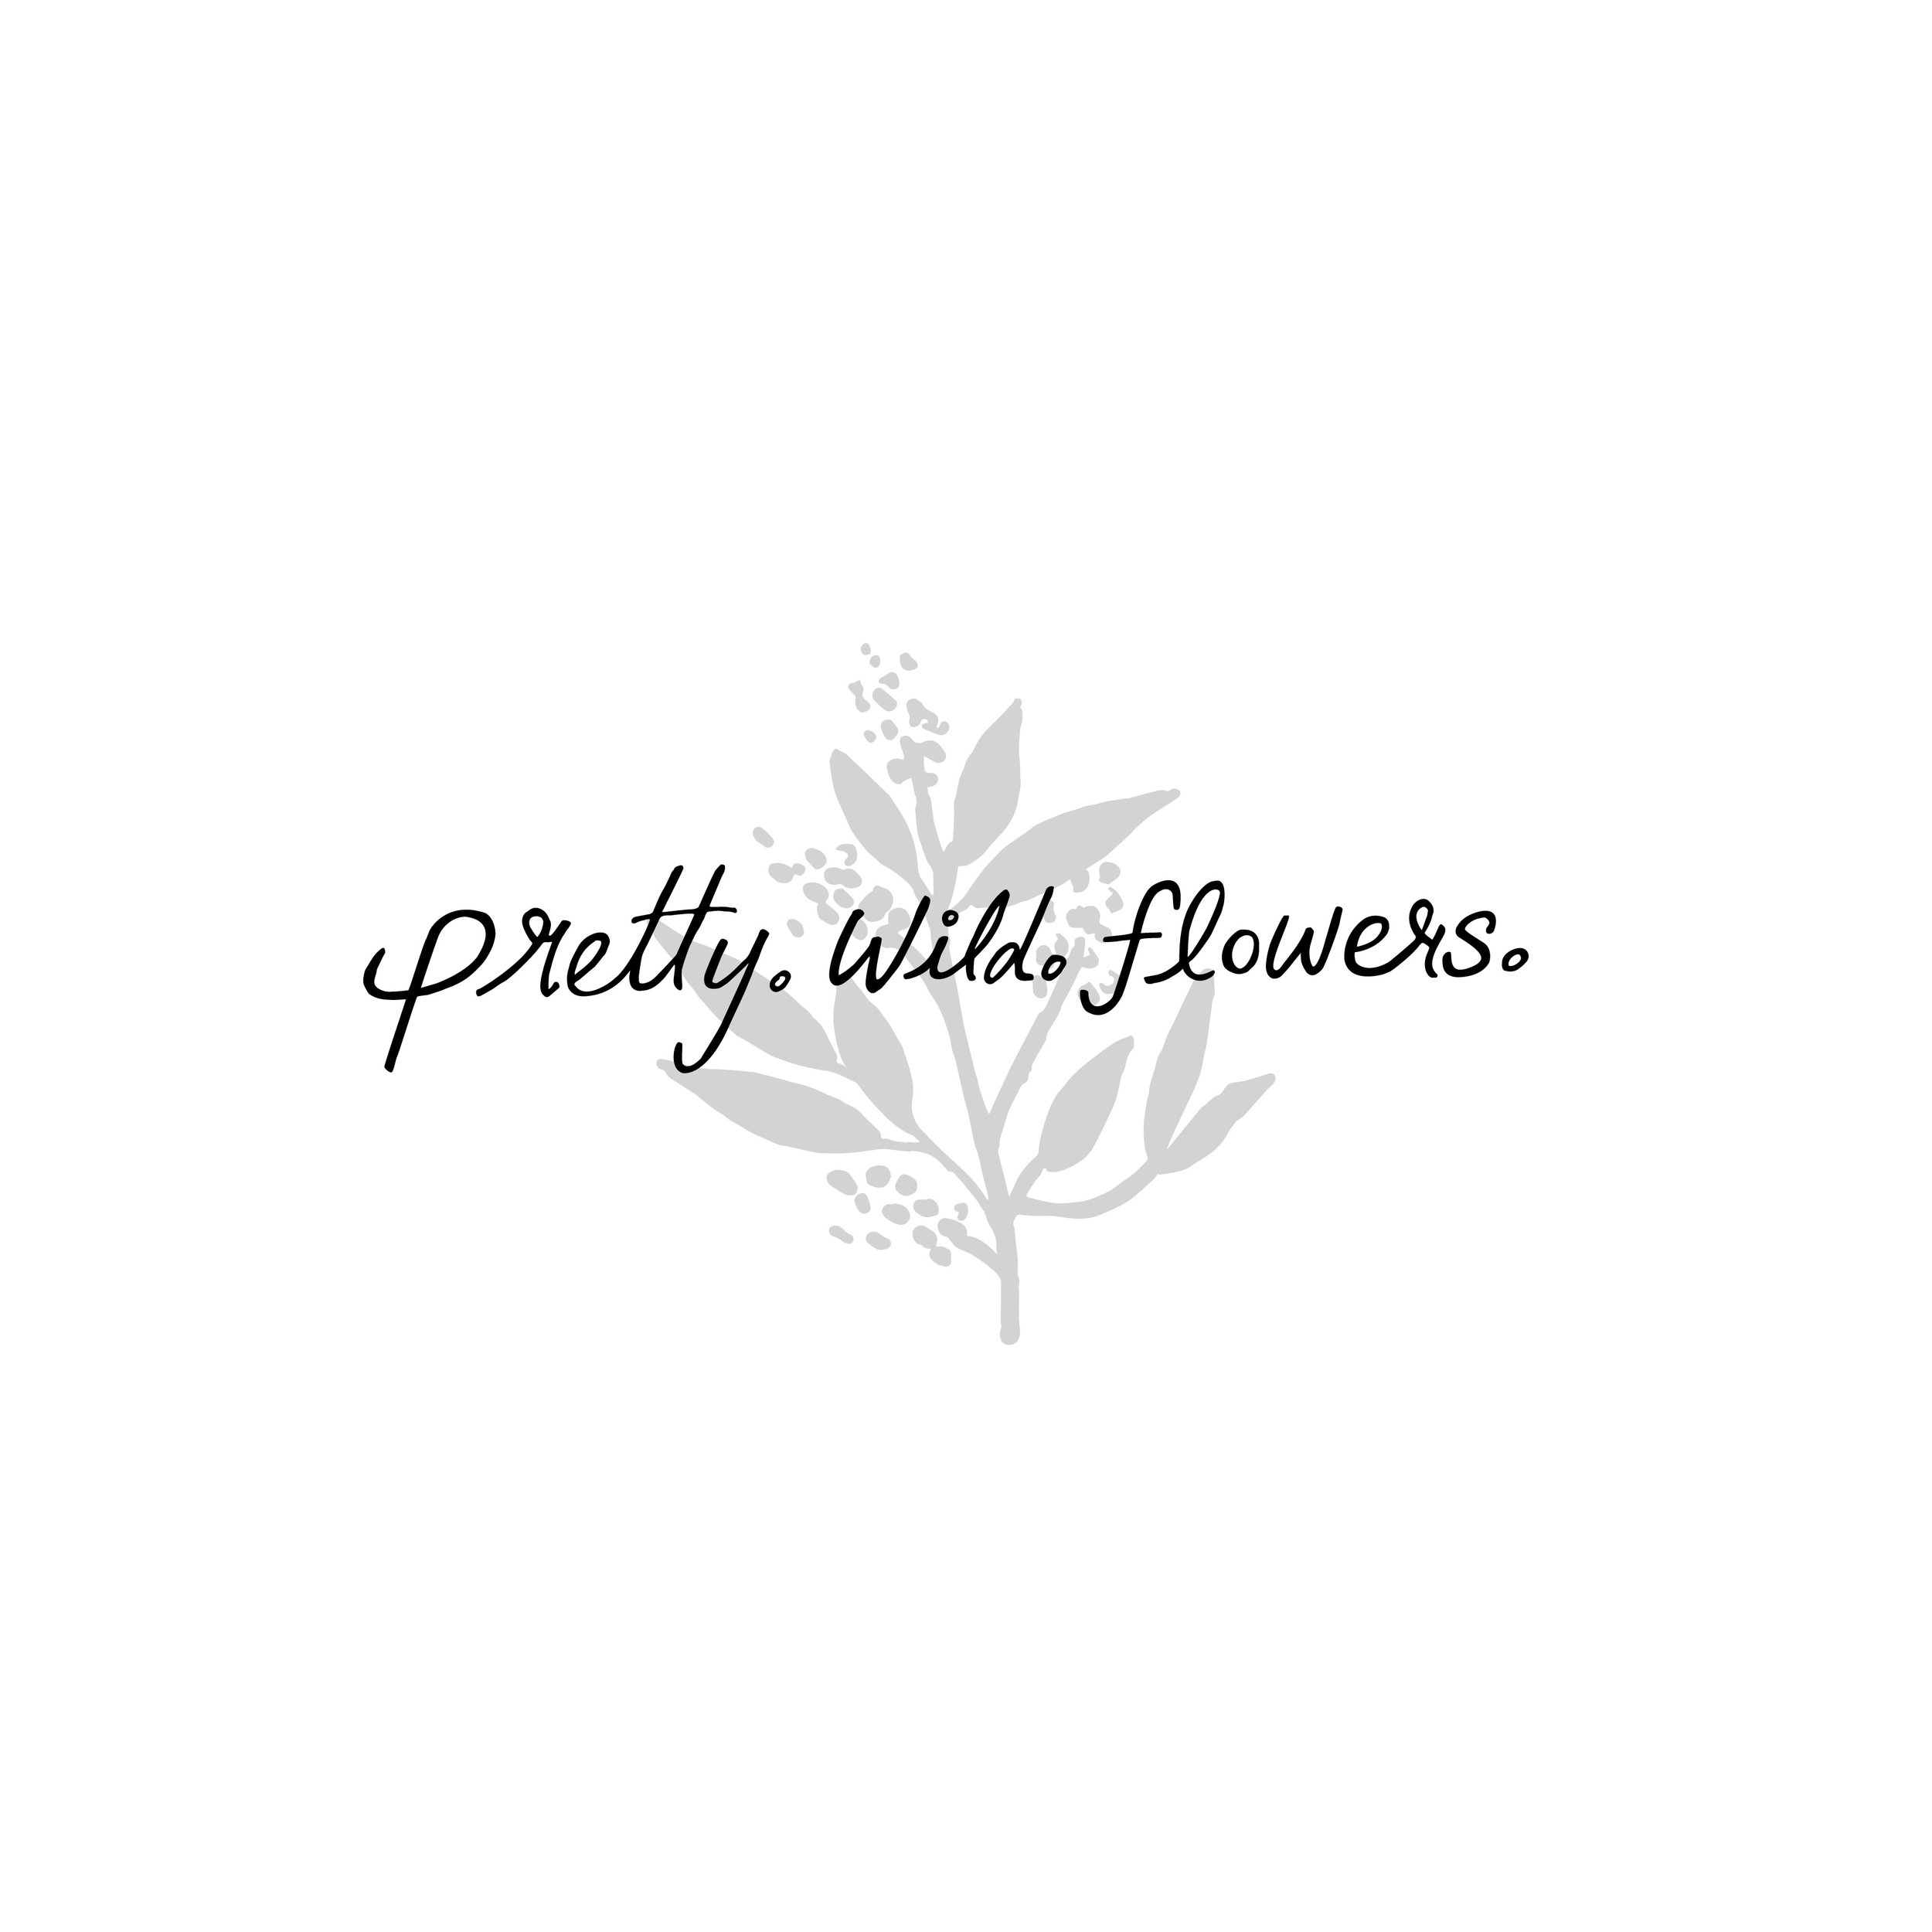 pretty_wild_flowers_large_euc2_square.jpg